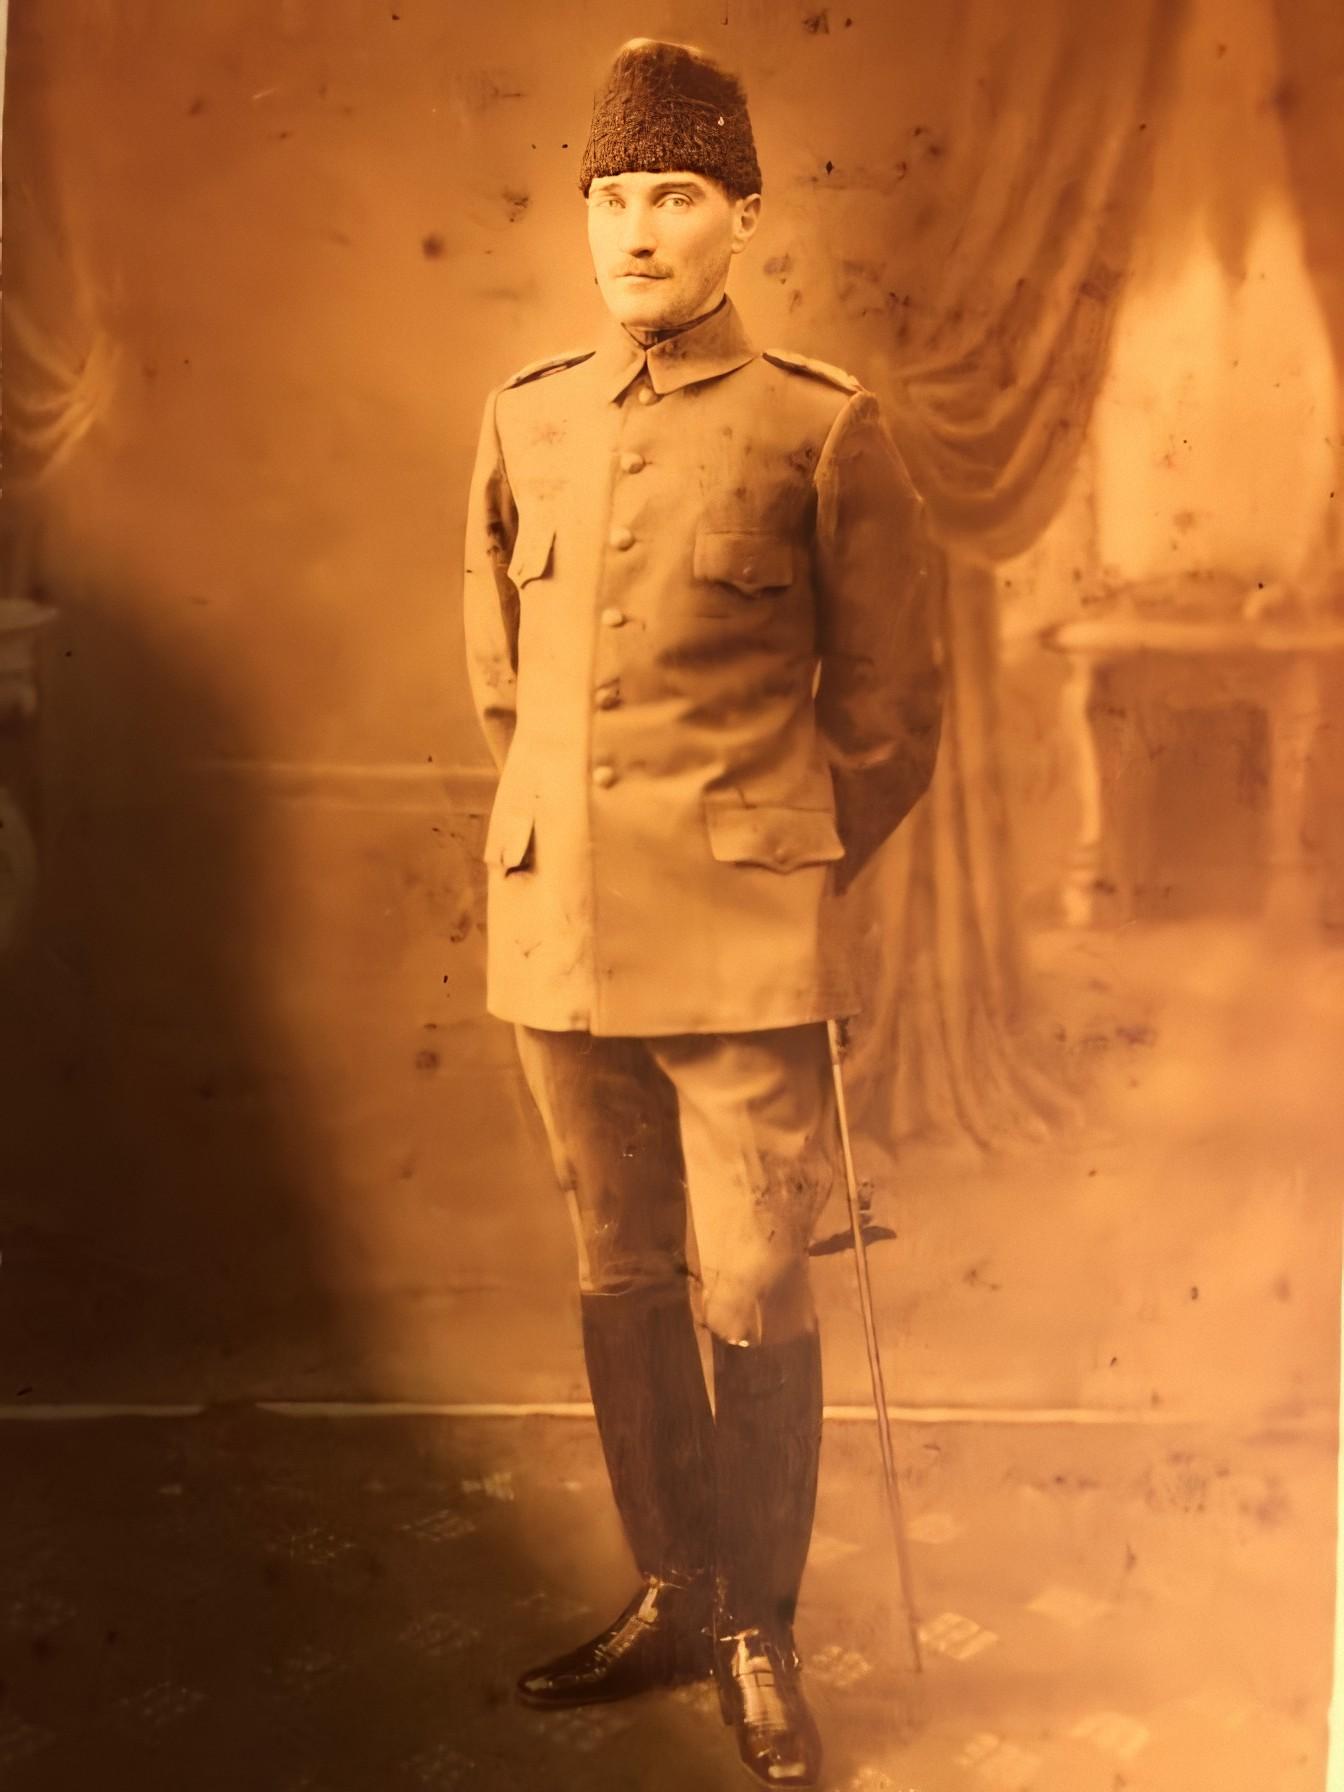 Sofya Askeri Ateşesi Yarbay Mustafa Kemal Bey, 1914.